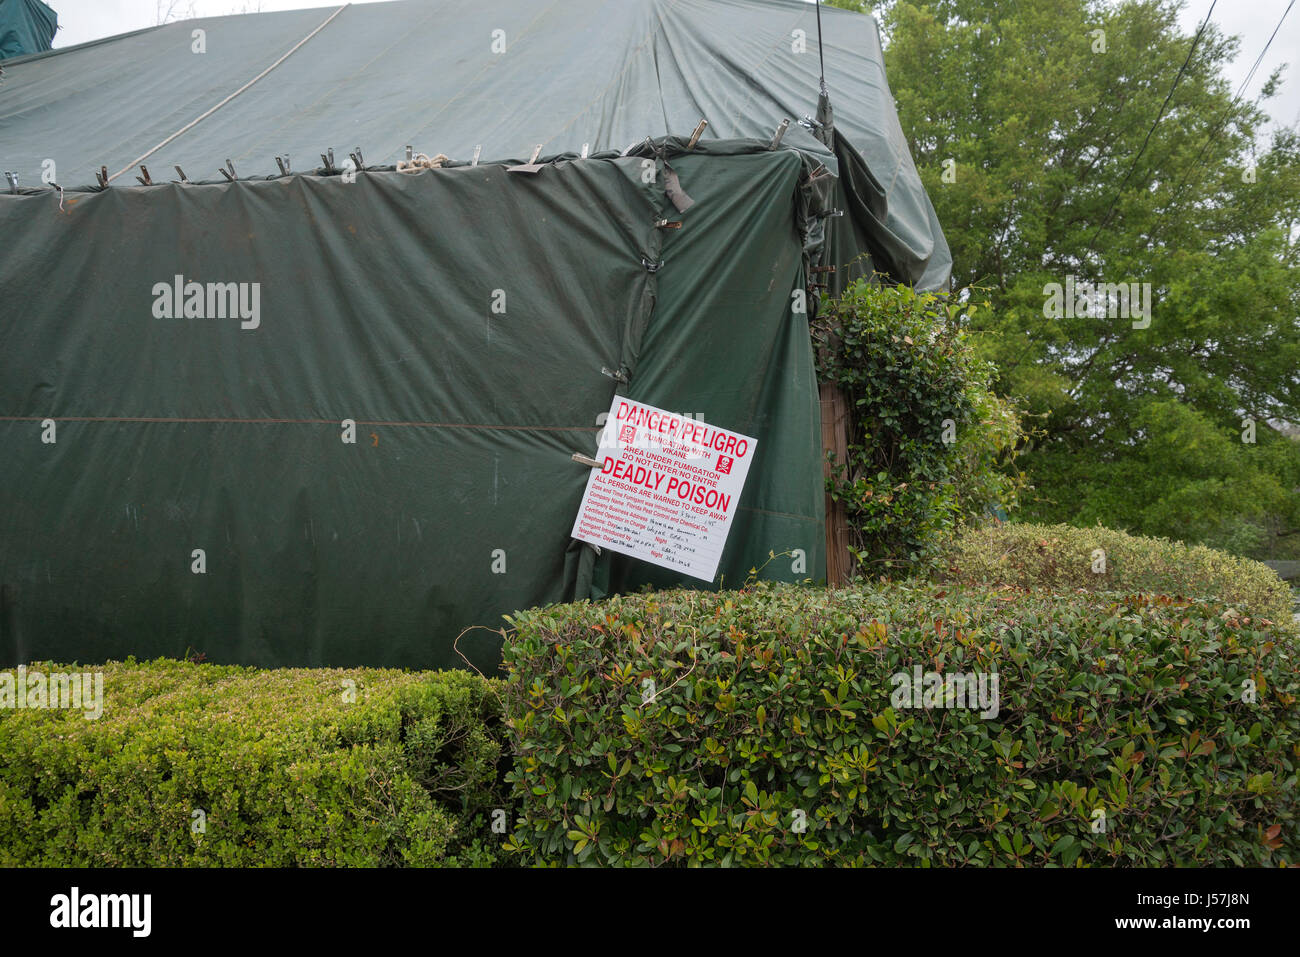 Tent fumigation of home & Tent fumigation of home Stock Photo Royalty Free Image: 140924245 ...